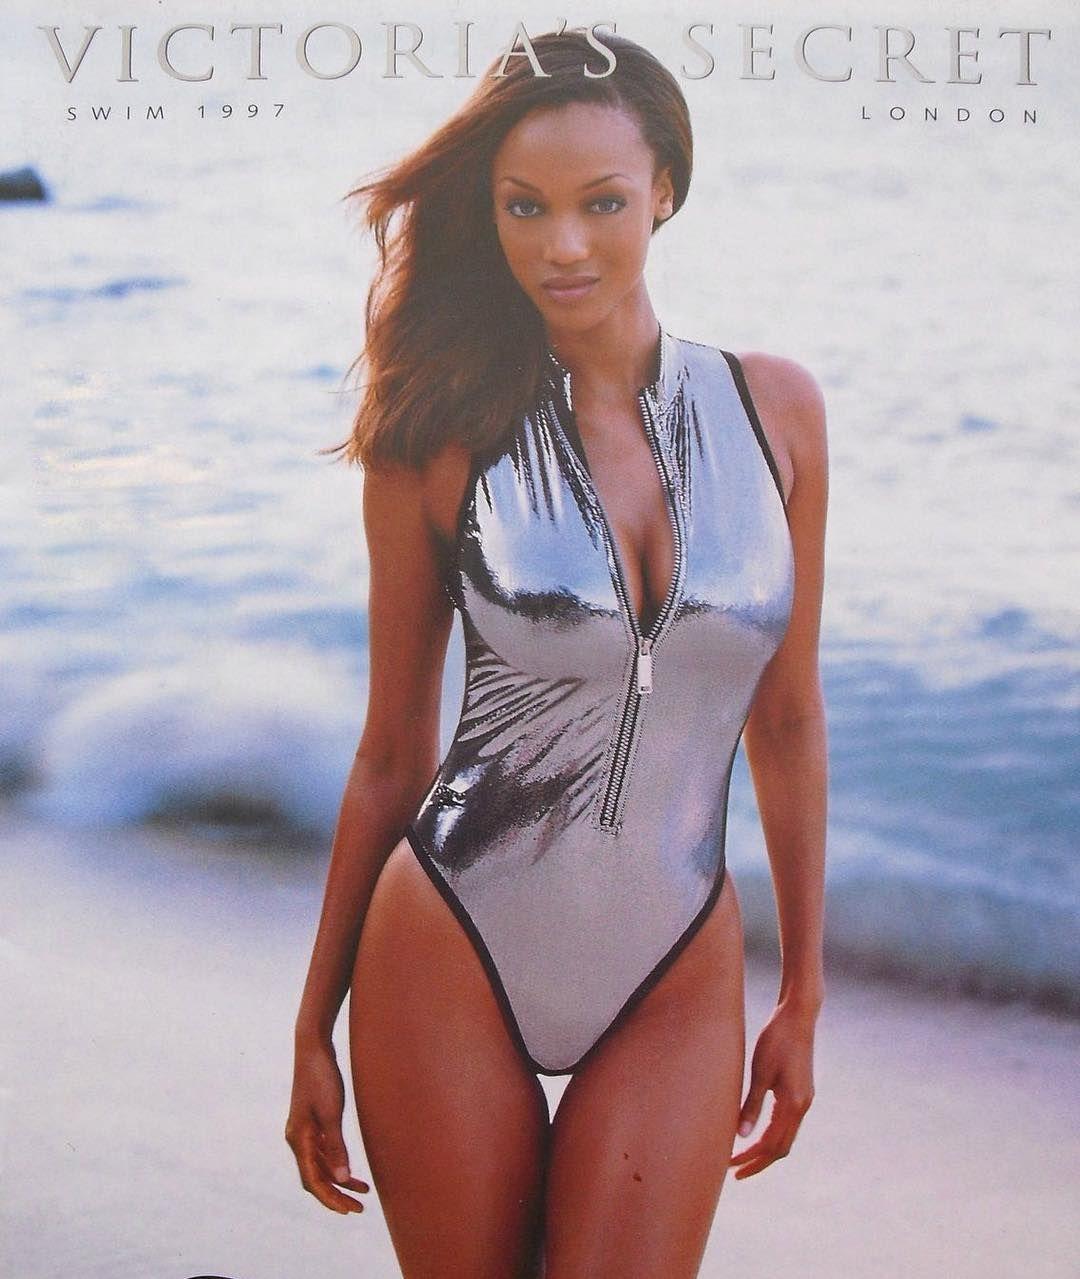 swimsuit photos banks victoria secret tyra